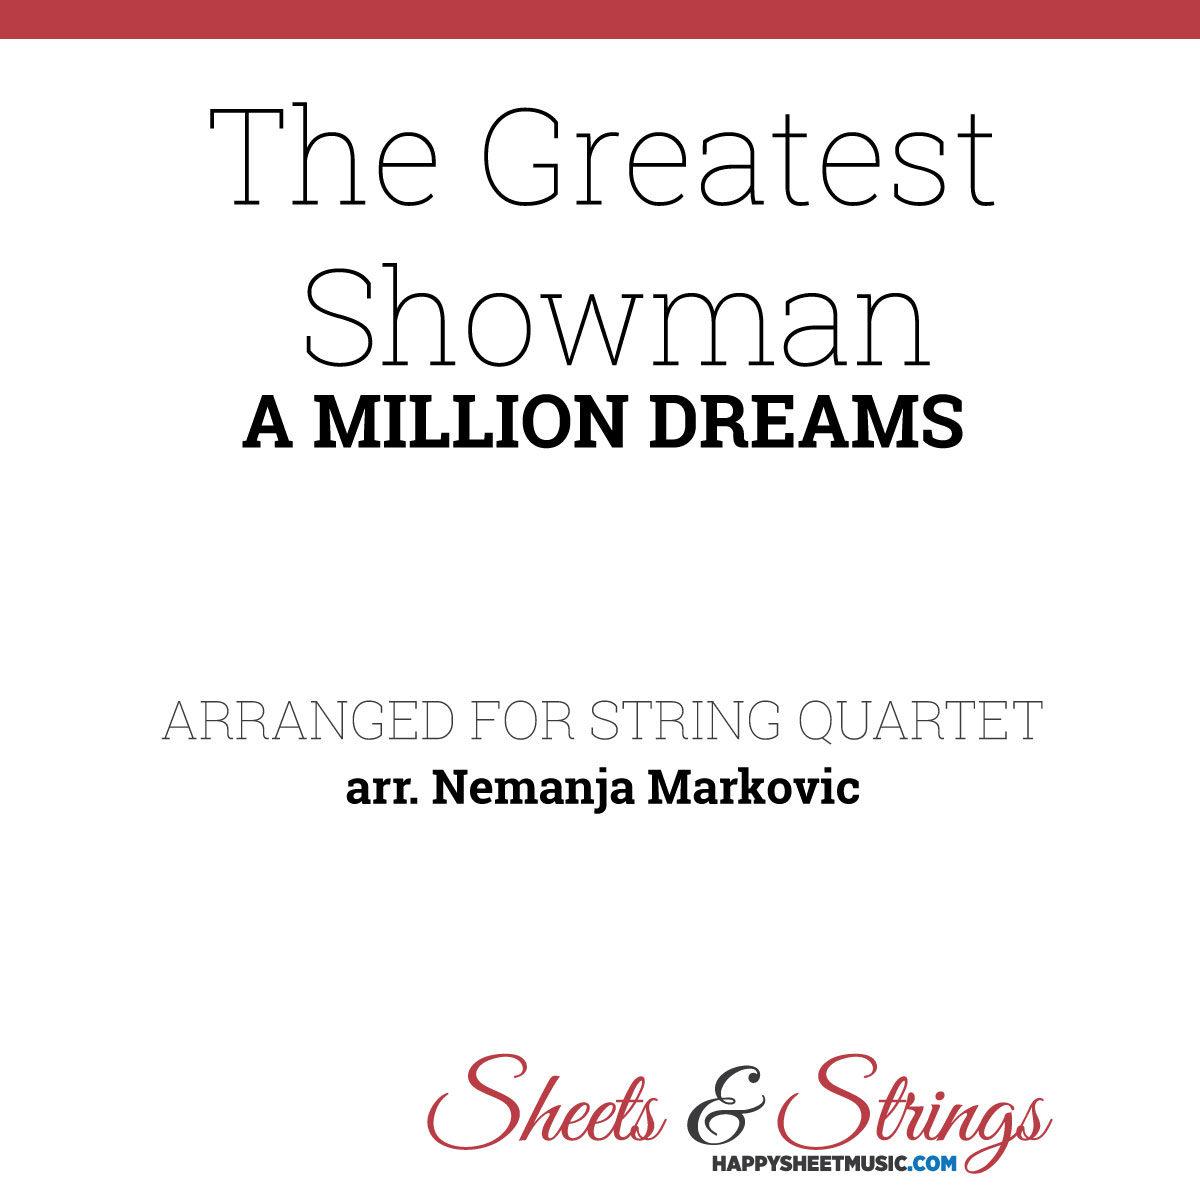 The Greatest Showman - A Million Dreams - Sheet Music for String Quartet - Music Arrangement for String Quartet